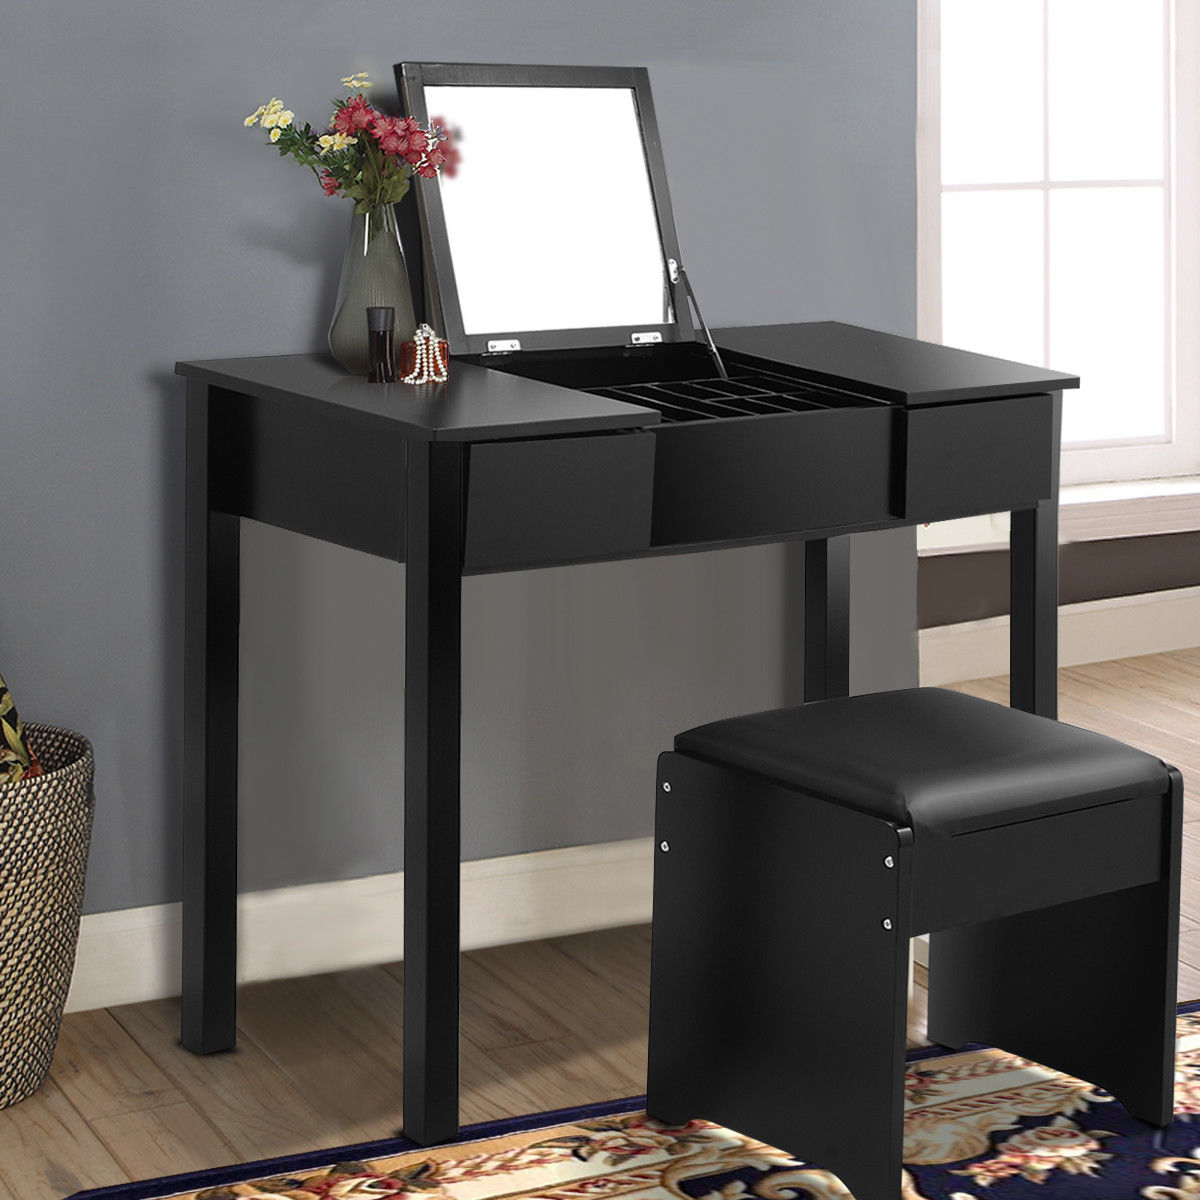 Costway Black Vanity Dressing Table Set Mirrored bathroom Furniture W/Stool &Storage Box